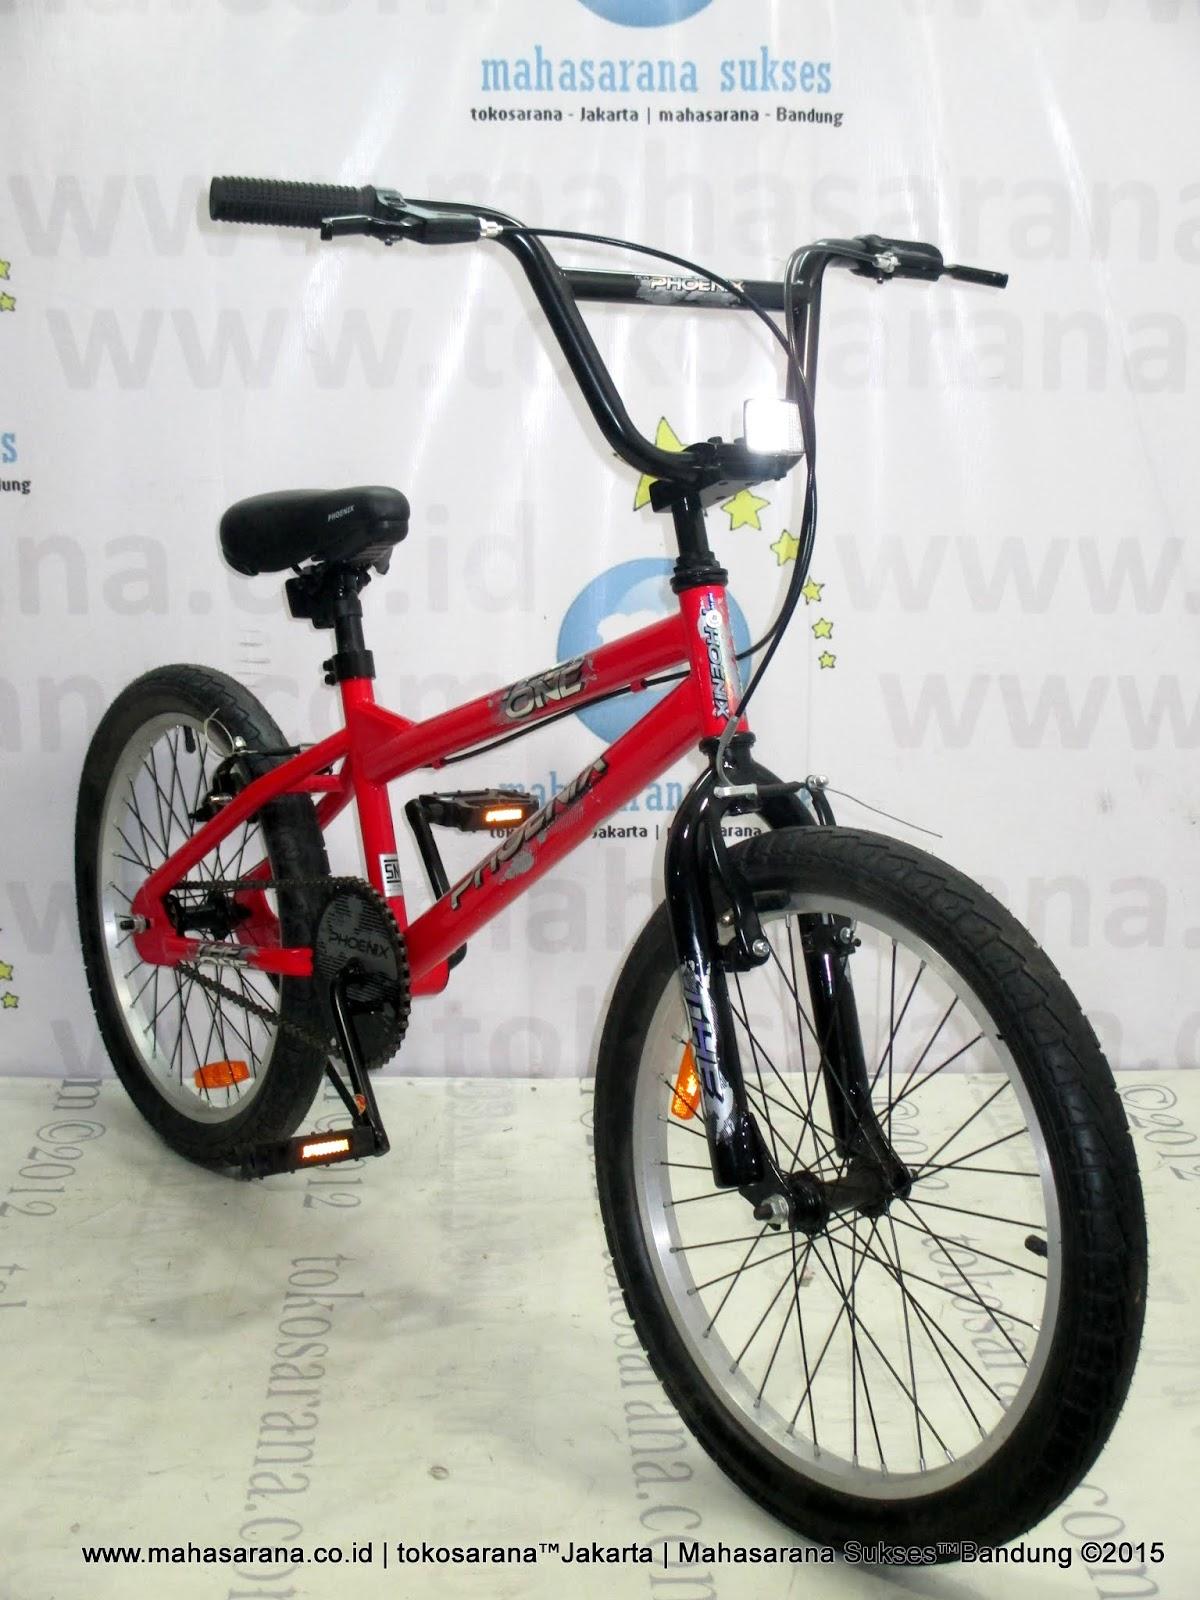 Tokosarana Mahasarana Sukses Sepeda Bmx Phoenix 717 6 The One 20 Inci Red